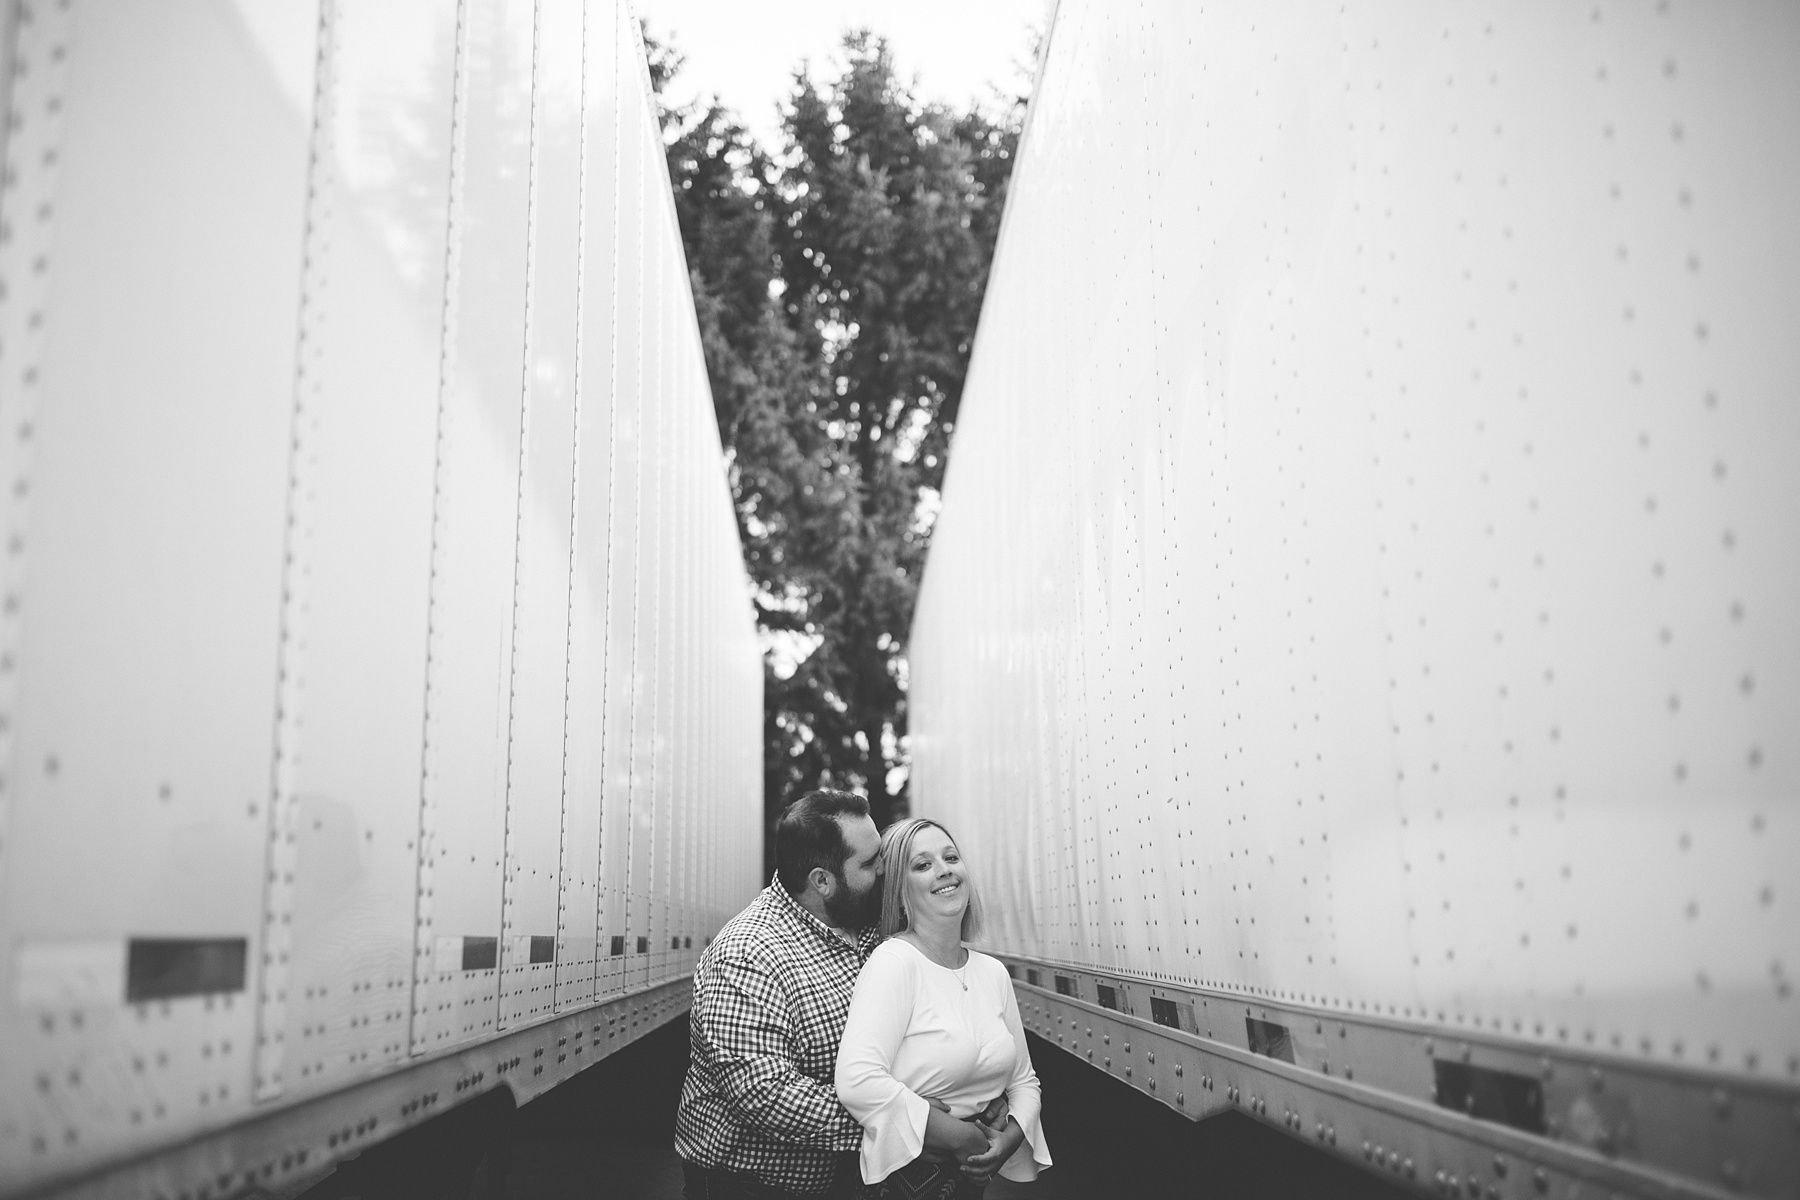 Brandon_Shafer_Photography_Megan_Nate_West_Michigan_Engagement_Photos_0014.jpg